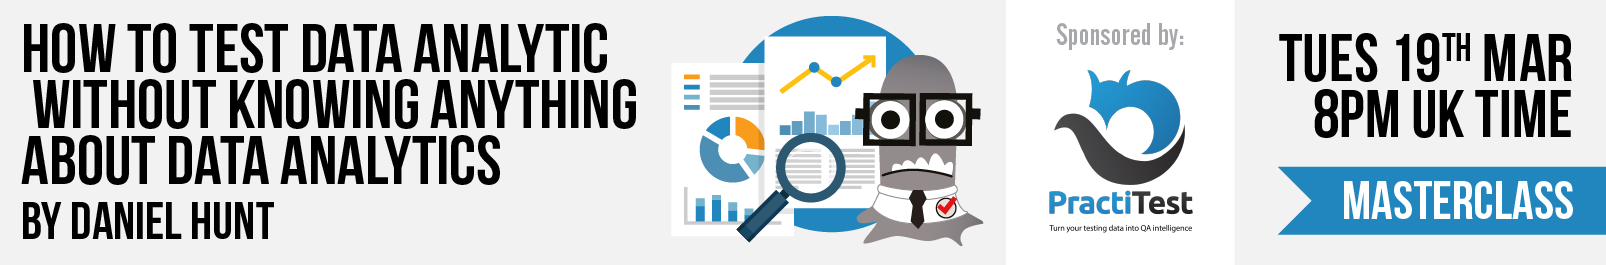 11 daniel hunt masterclass   how to test data analytics banner